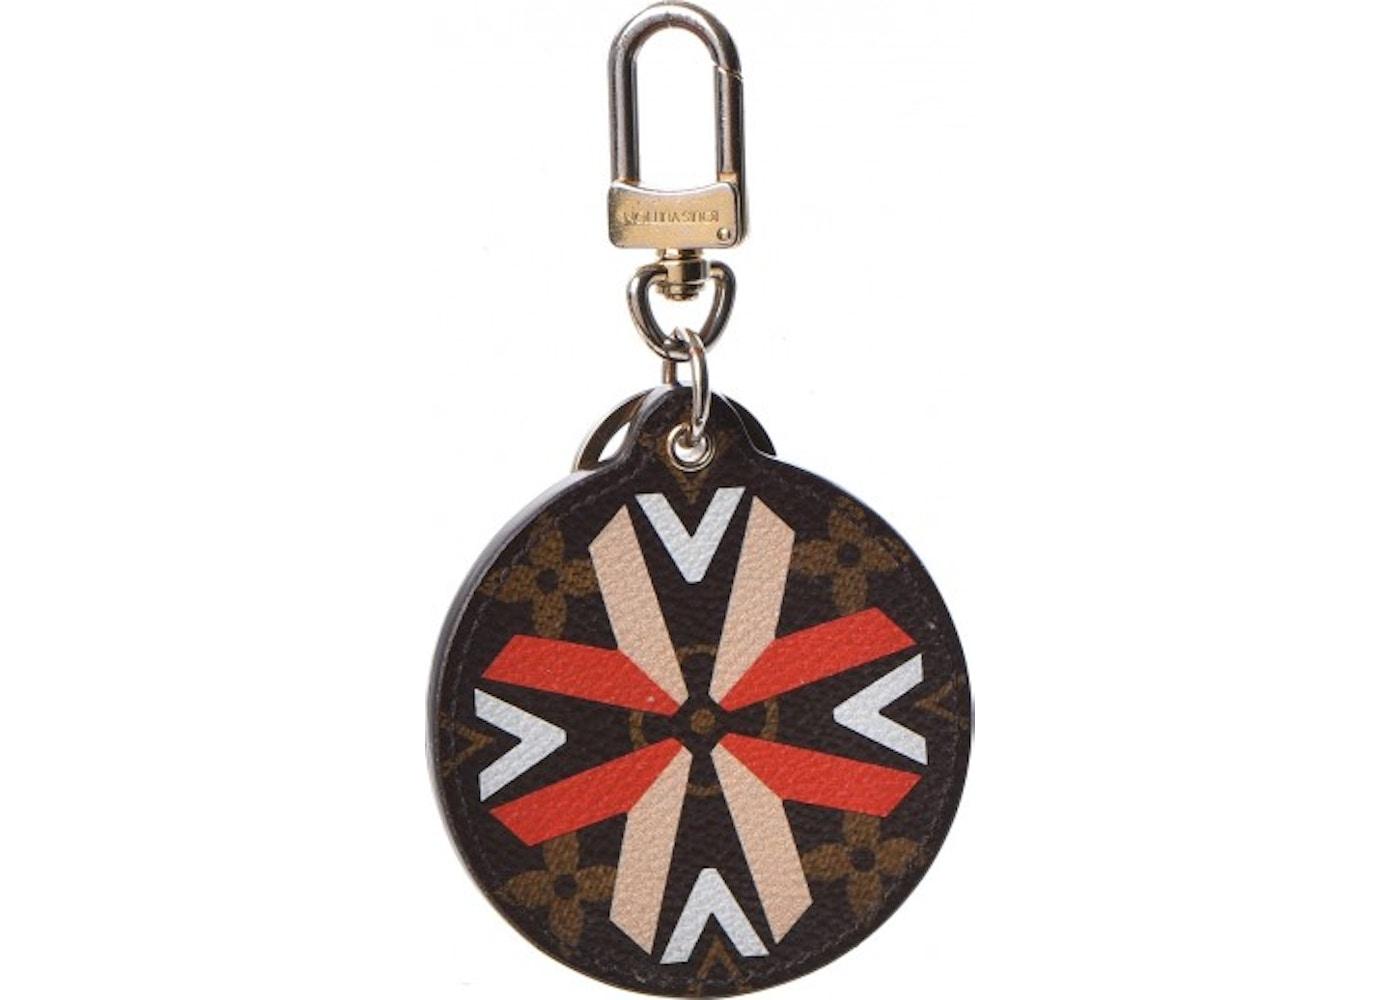 5848ddcc38 Louis Vuitton Bag Charm Key Ring Illustre Multi V Monogram Red ...